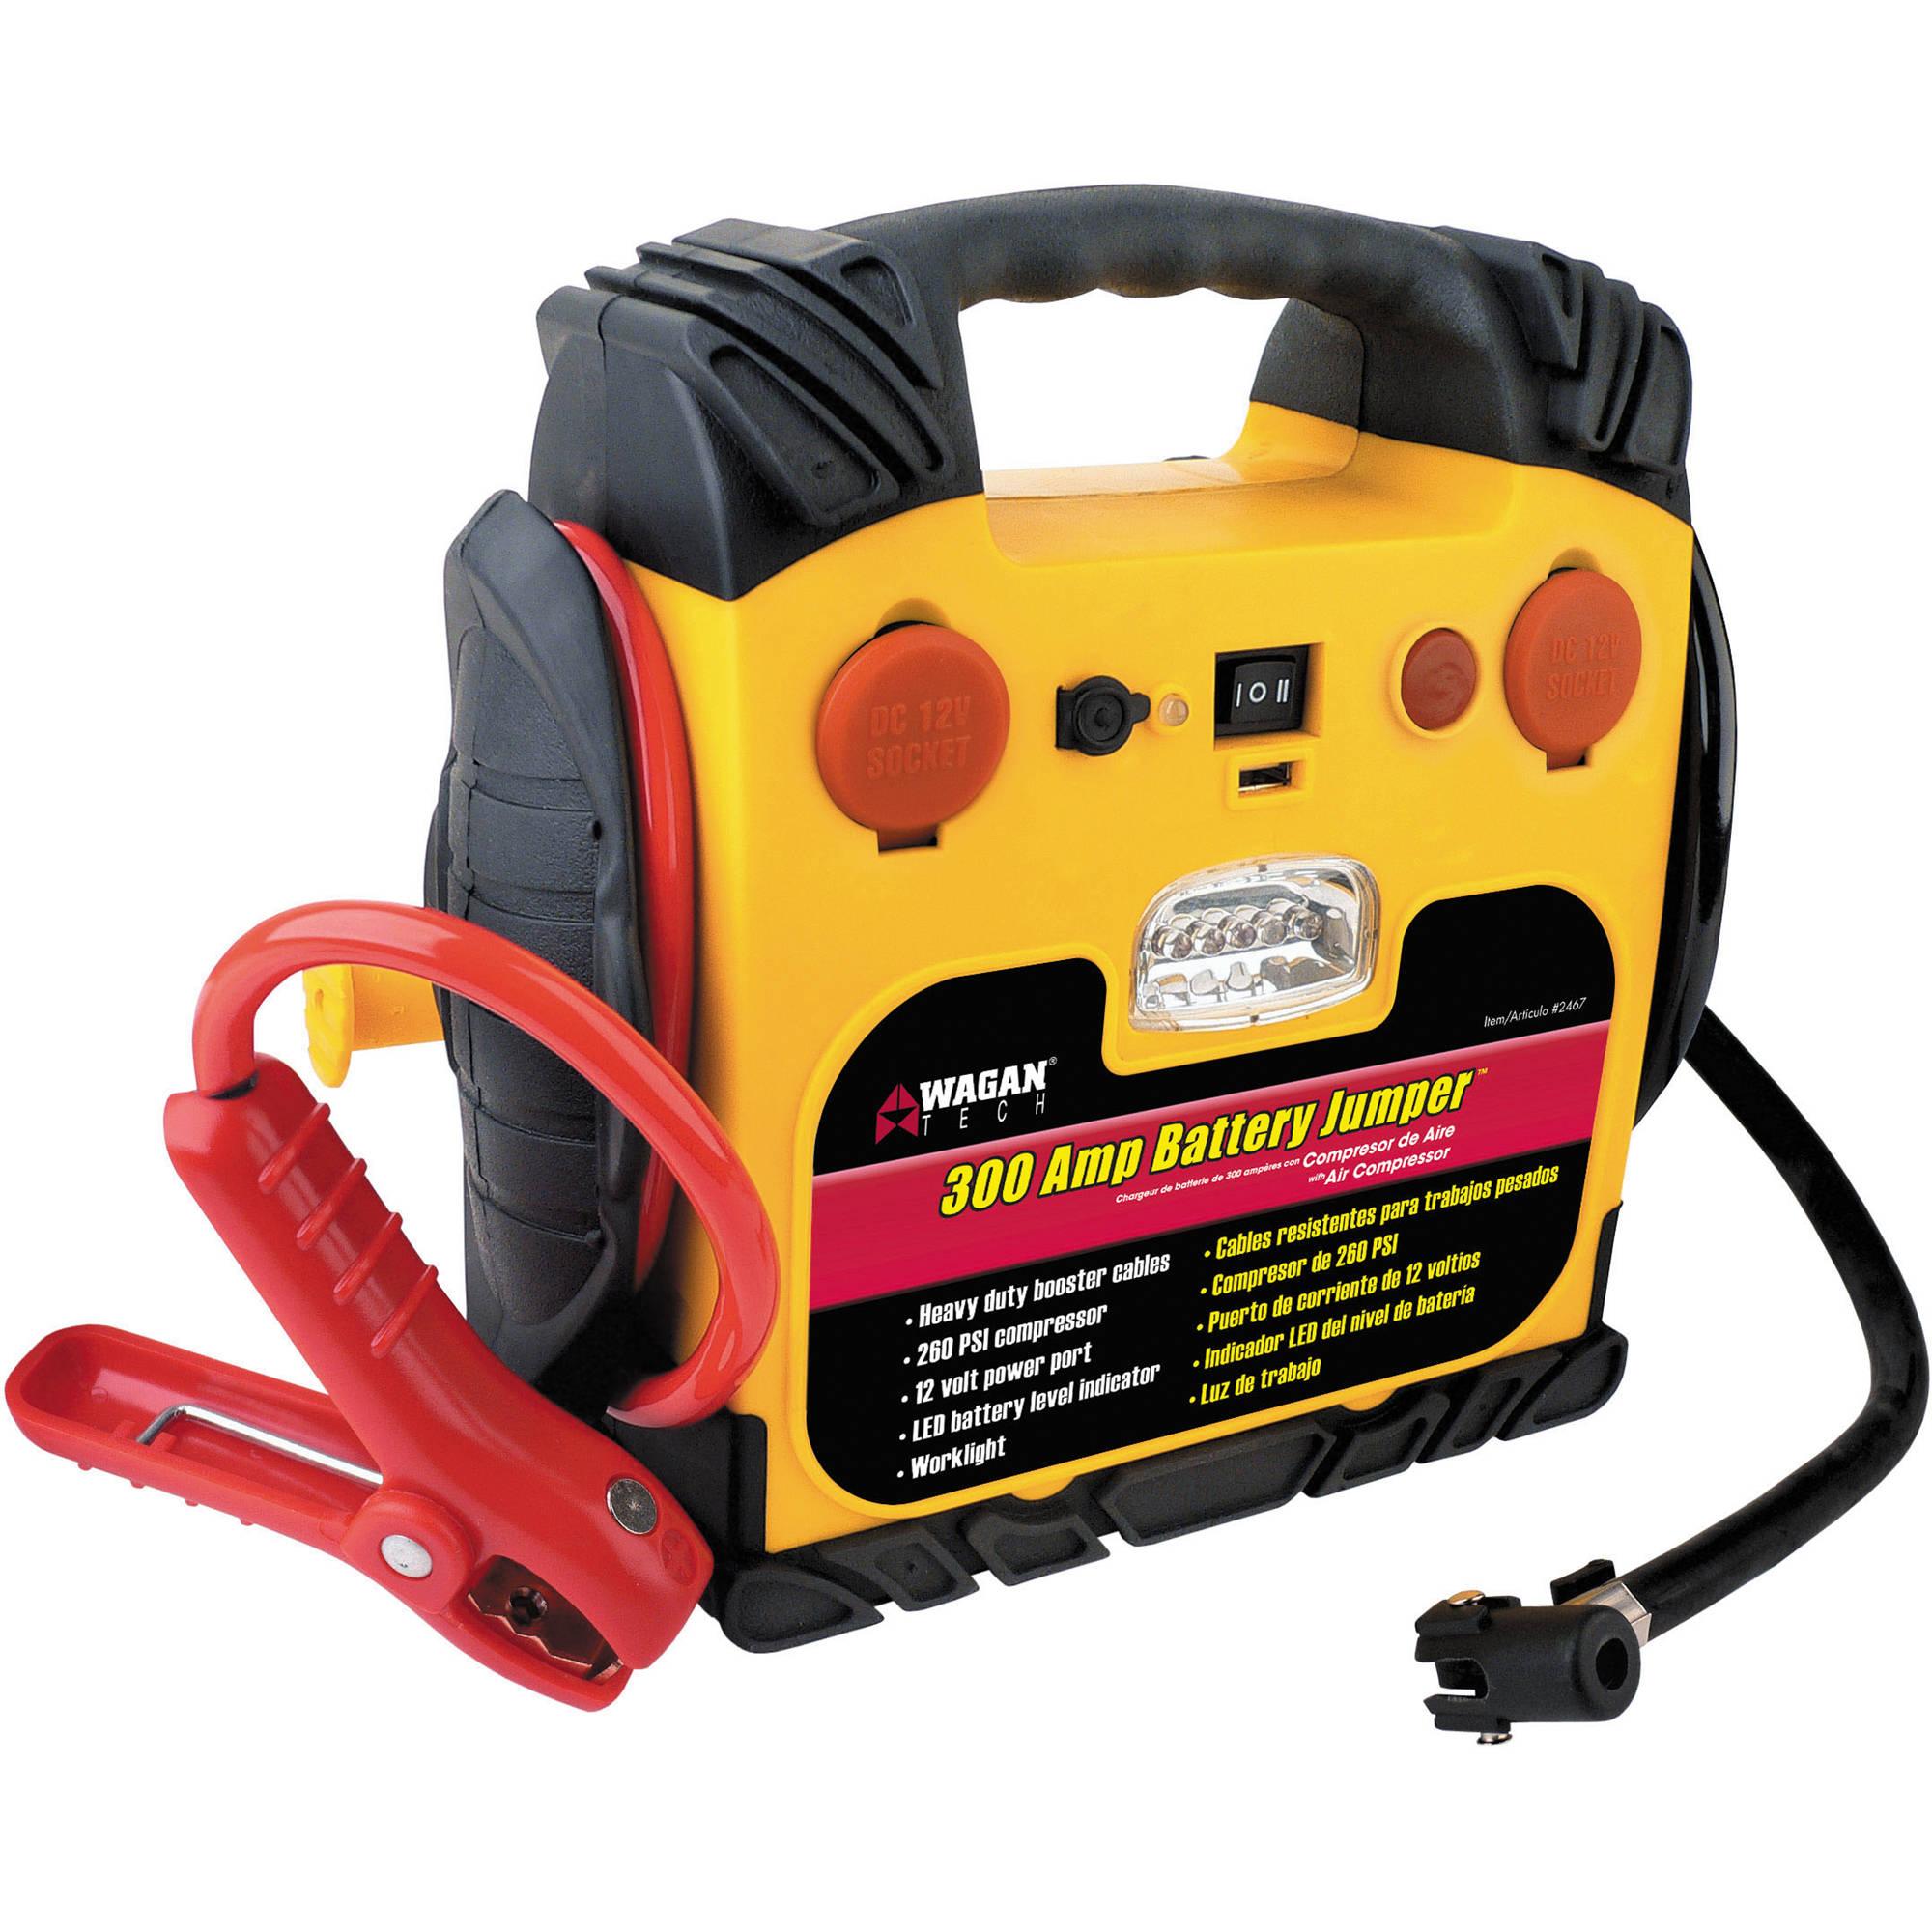 WAGAN 300 AMP Battery Jumper/Portable Power Station 2467 B&H